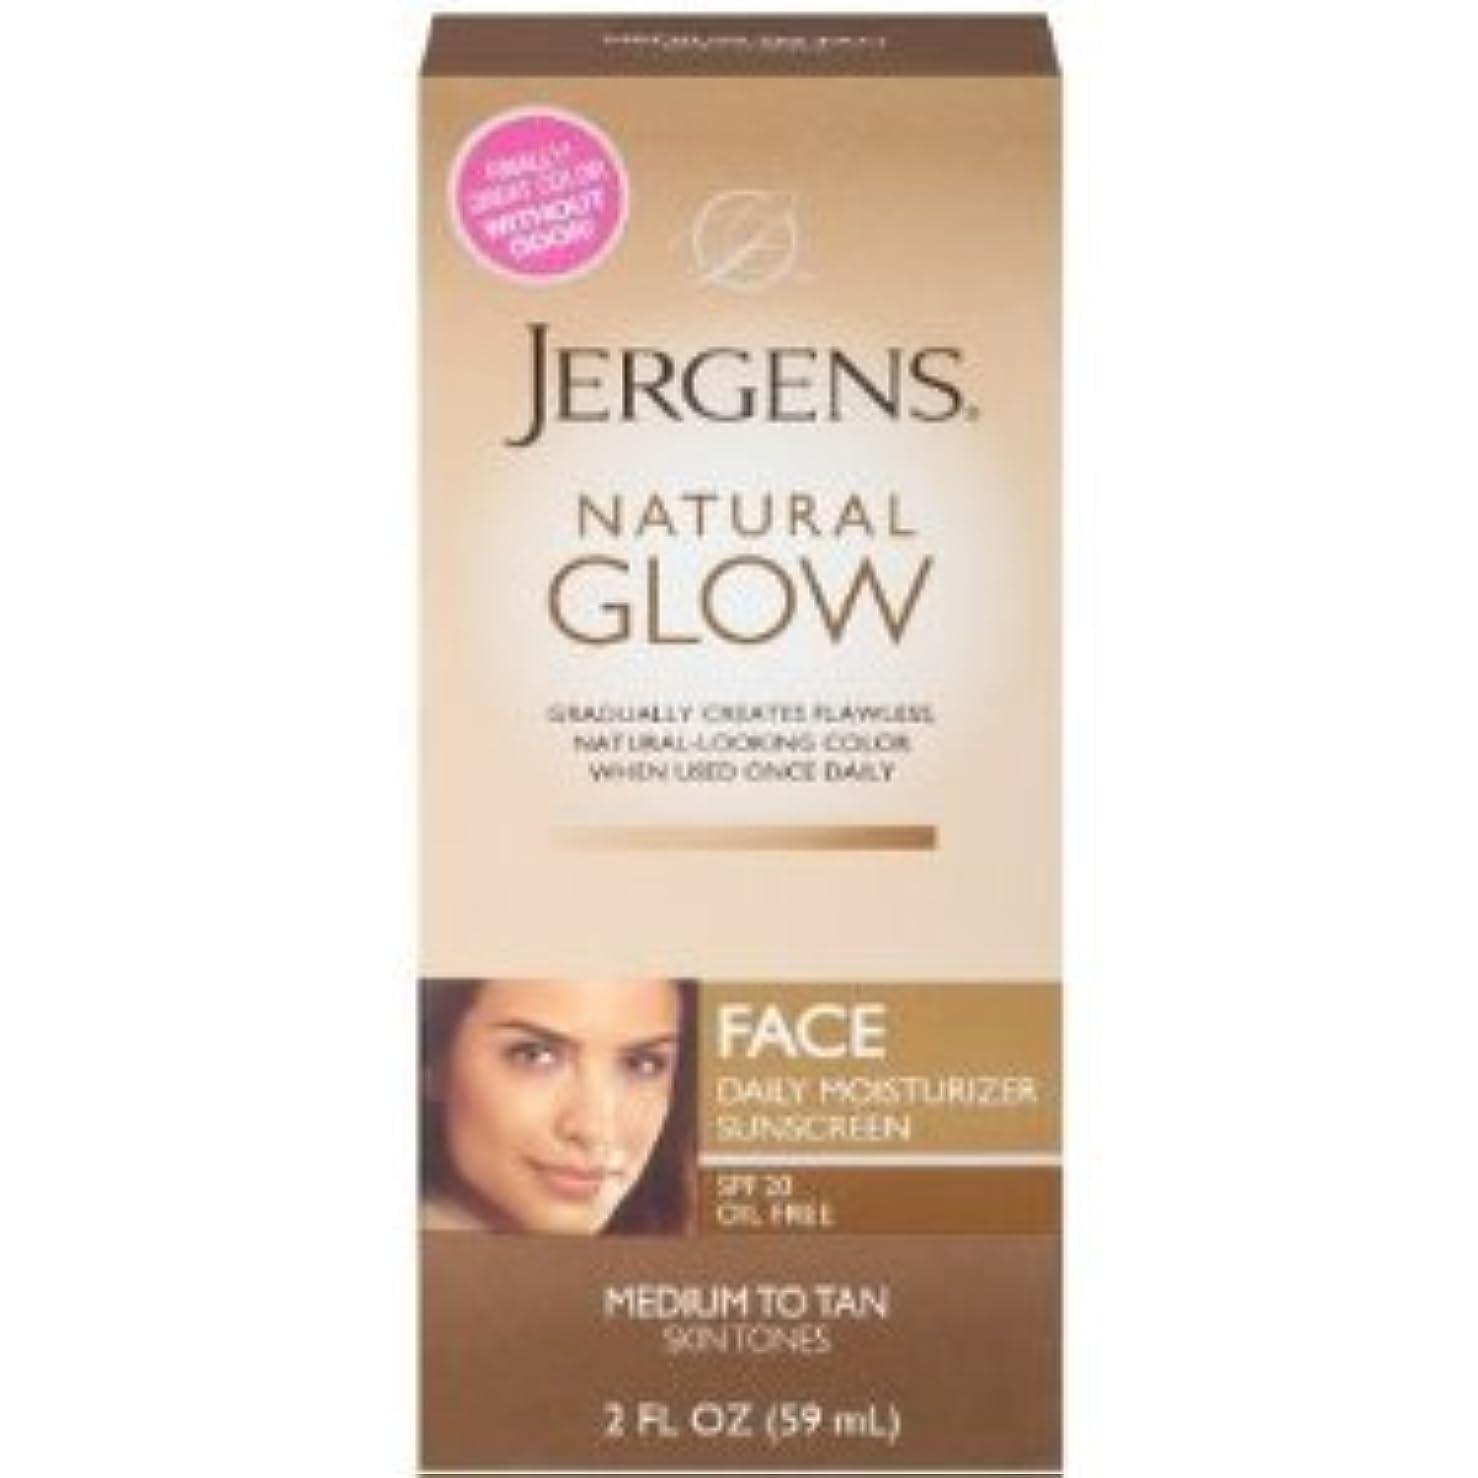 三角形鉛検出Natural Glow Healthy Complexion Daily Facial Moisturizer, SPF 20, Medium to Tan, (59ml) (海外直送品)